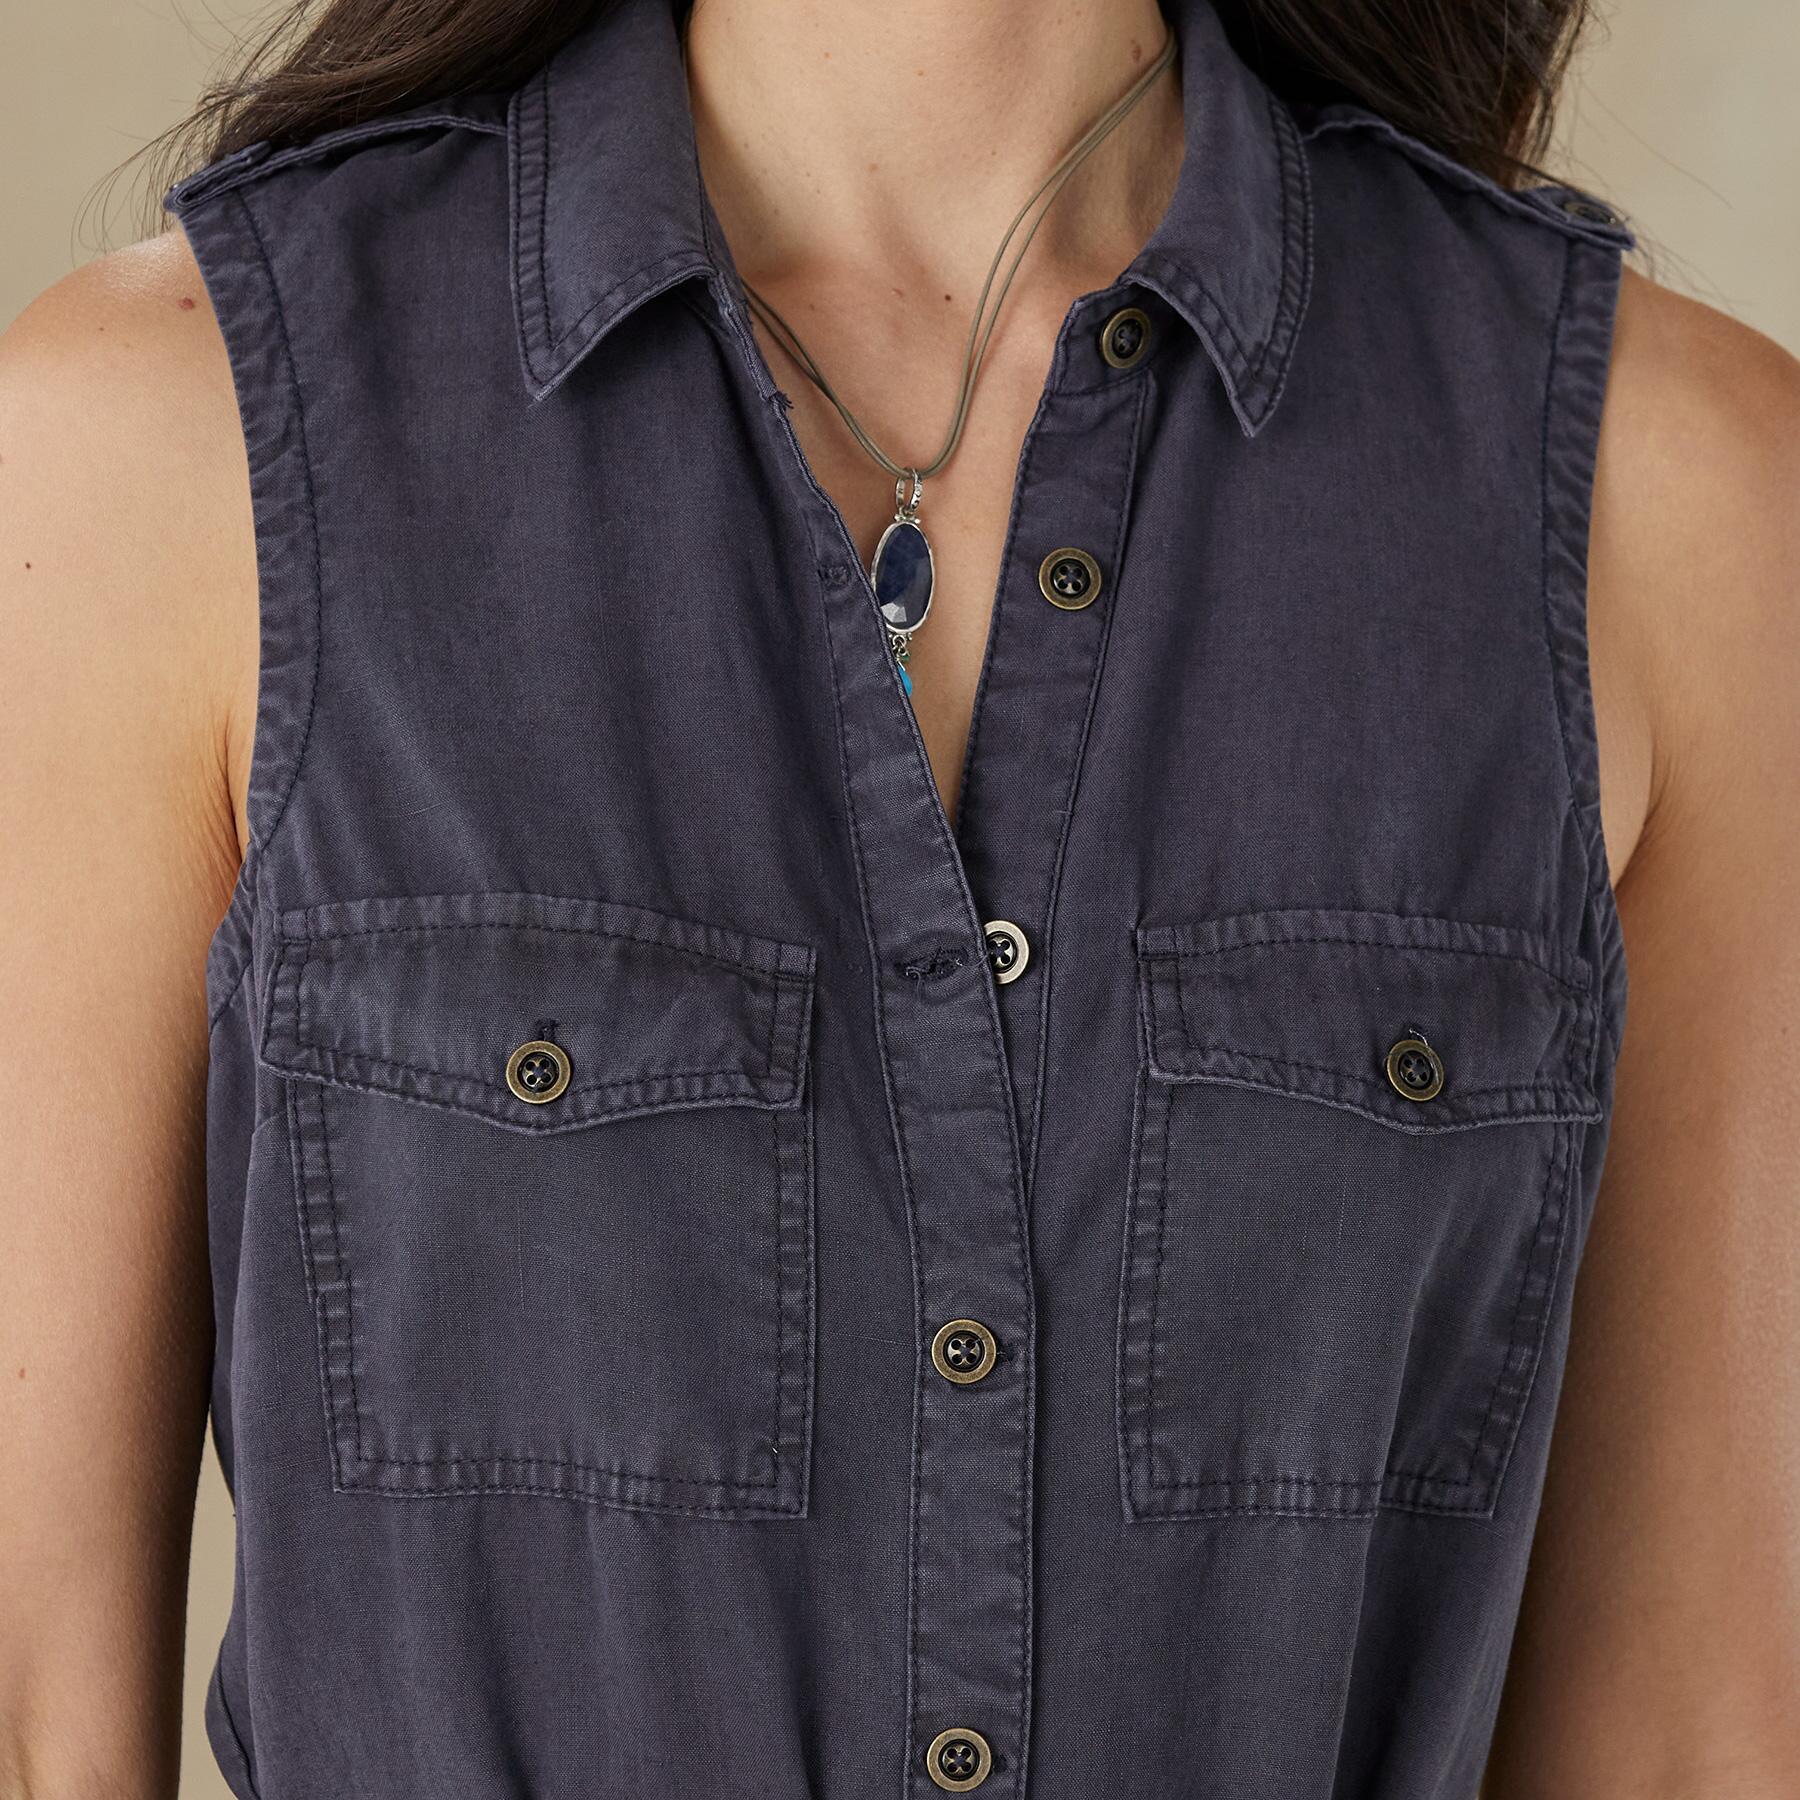 WESTWARD DRESS: View 3